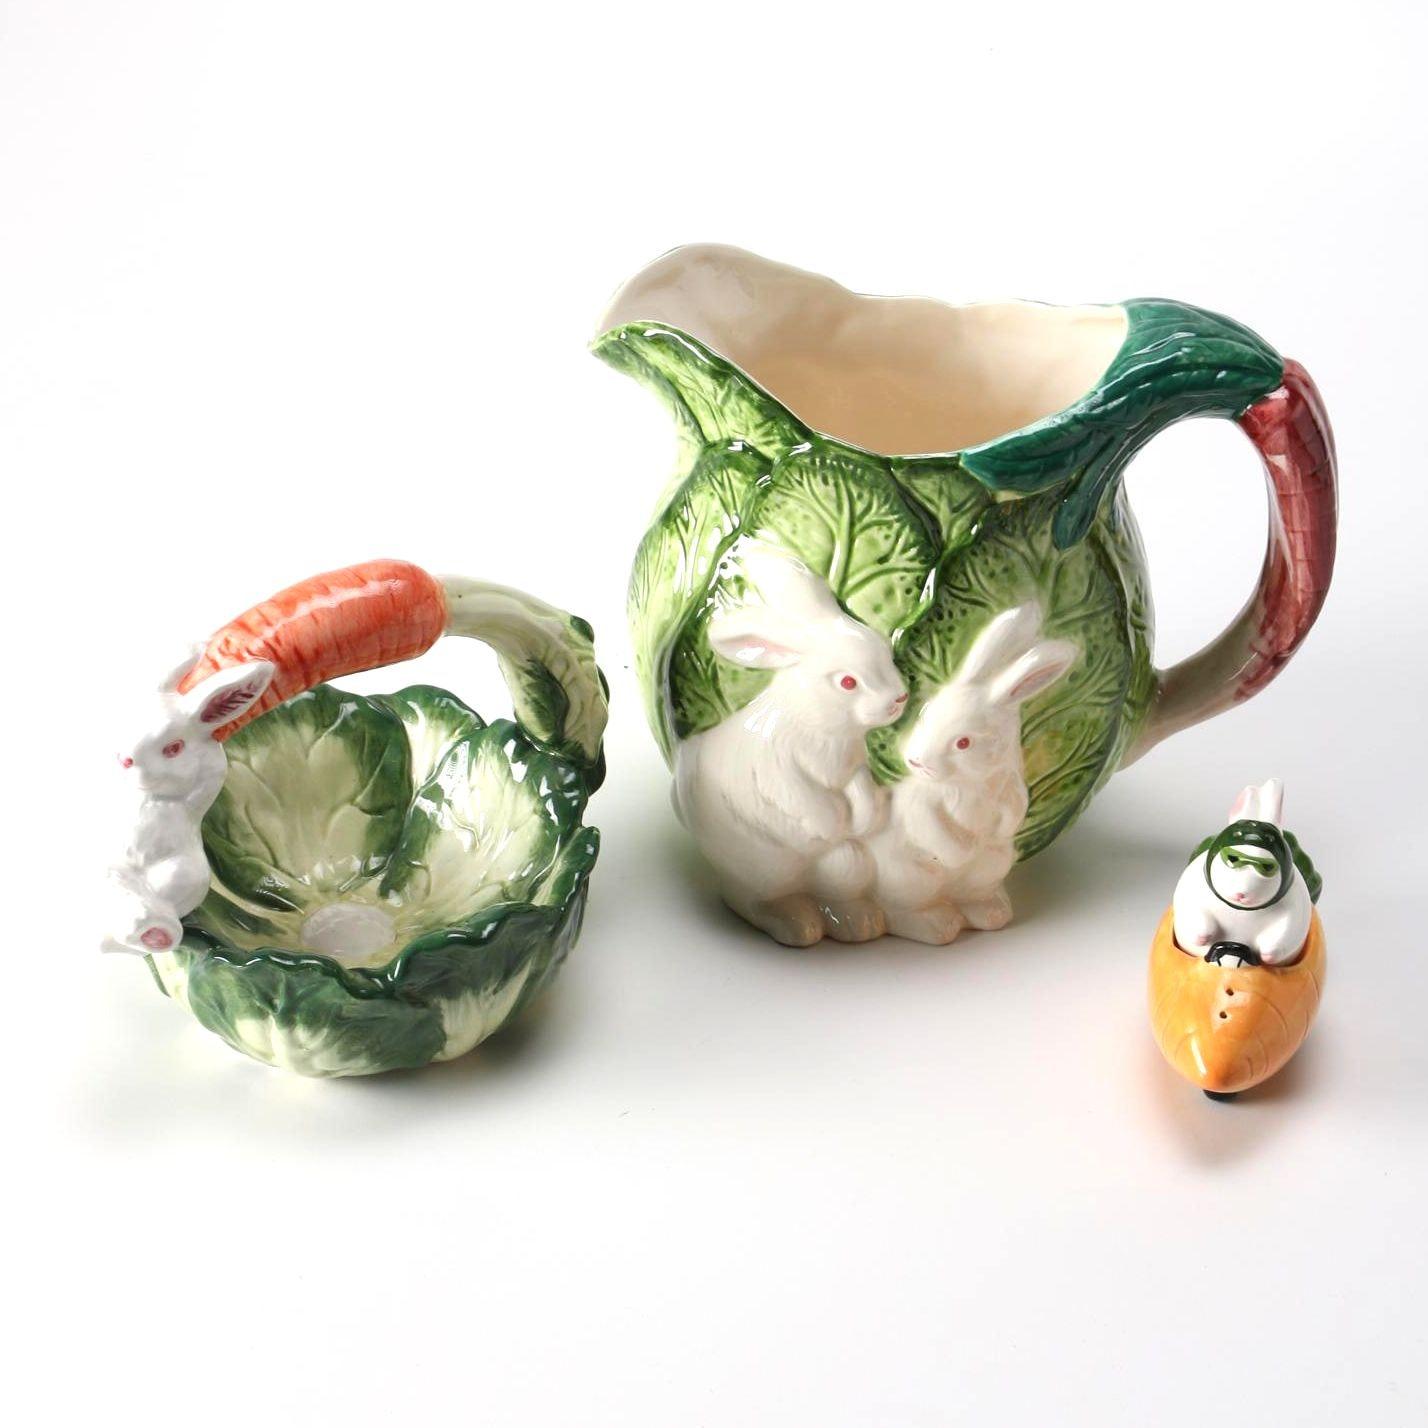 Group of Ceramic Rabbit-Themed Decor